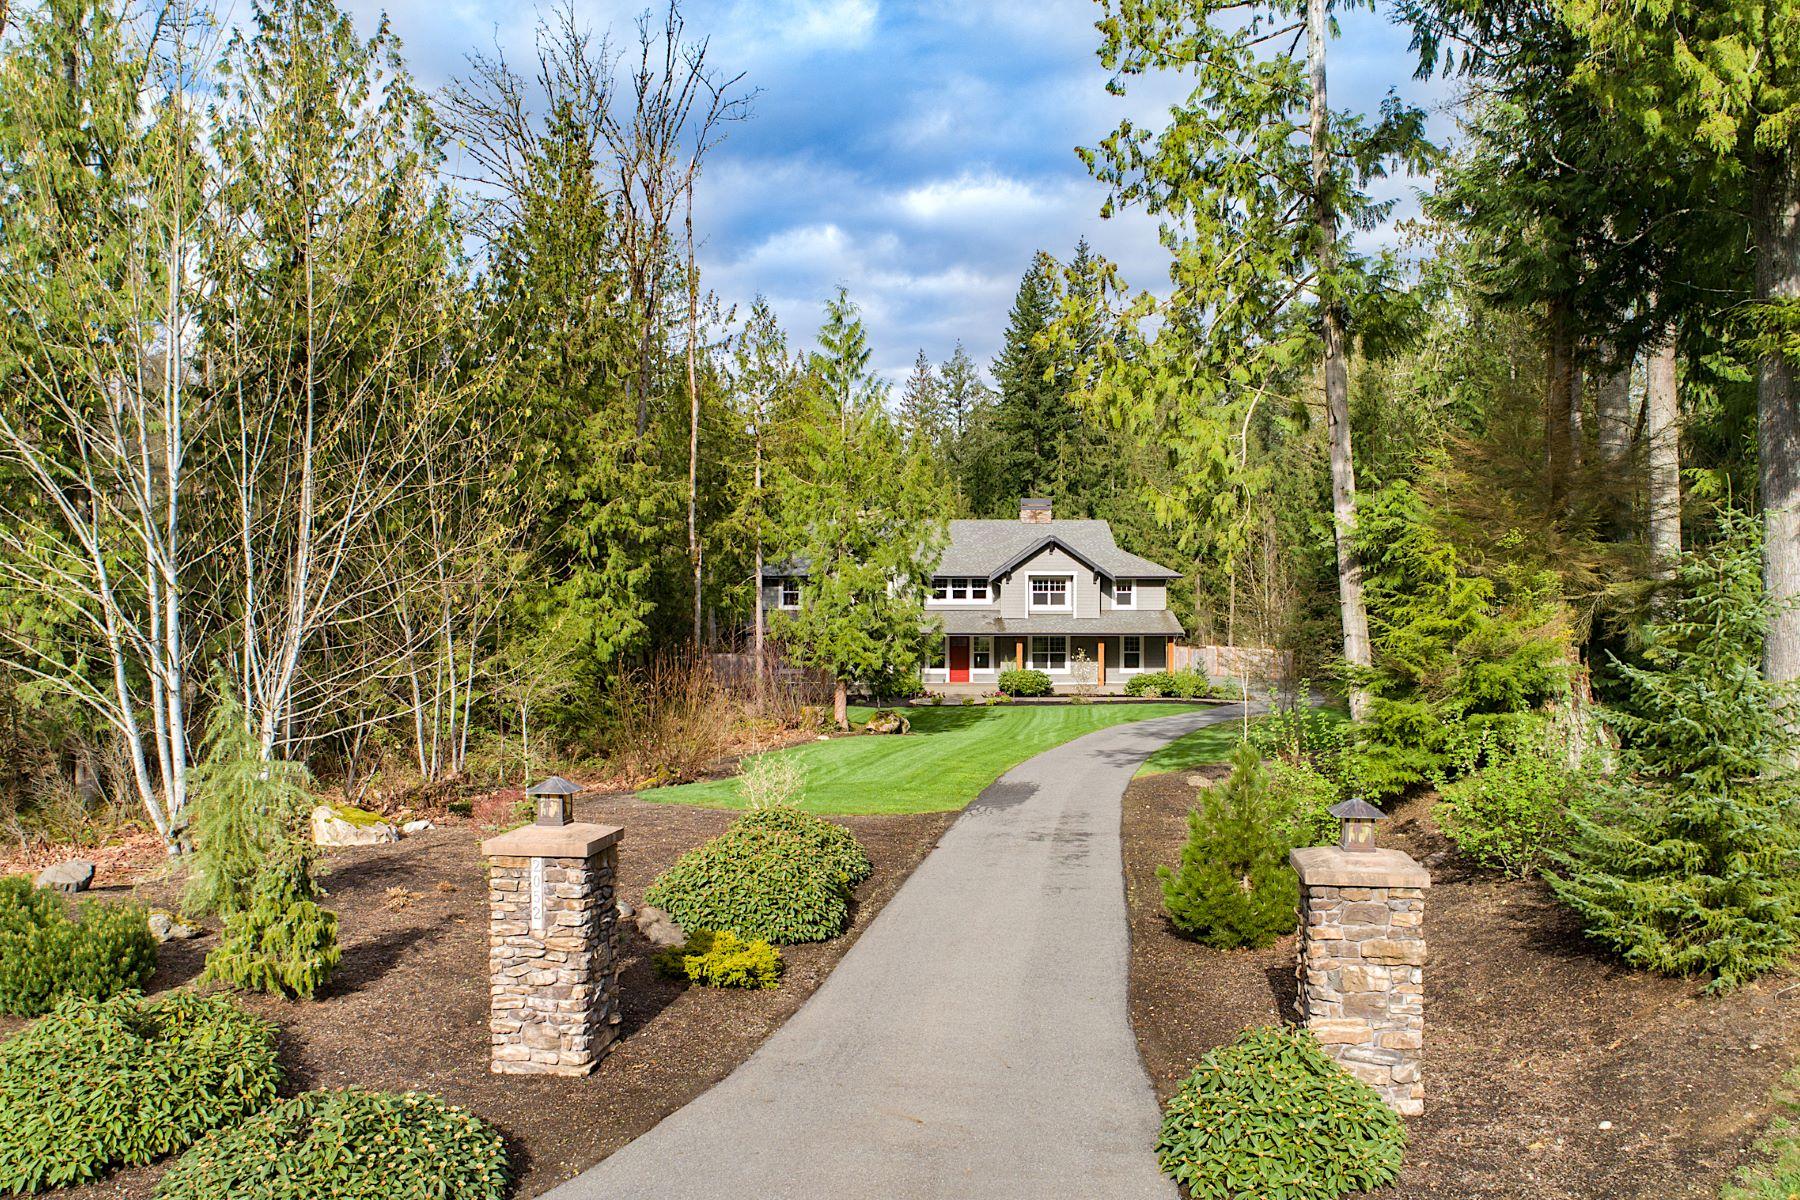 Single Family Homes for Sale at 2052 297th Way Southeast, Fall City, WA 98024 2052 297th Wy SE Fall City, Washington 98024 United States